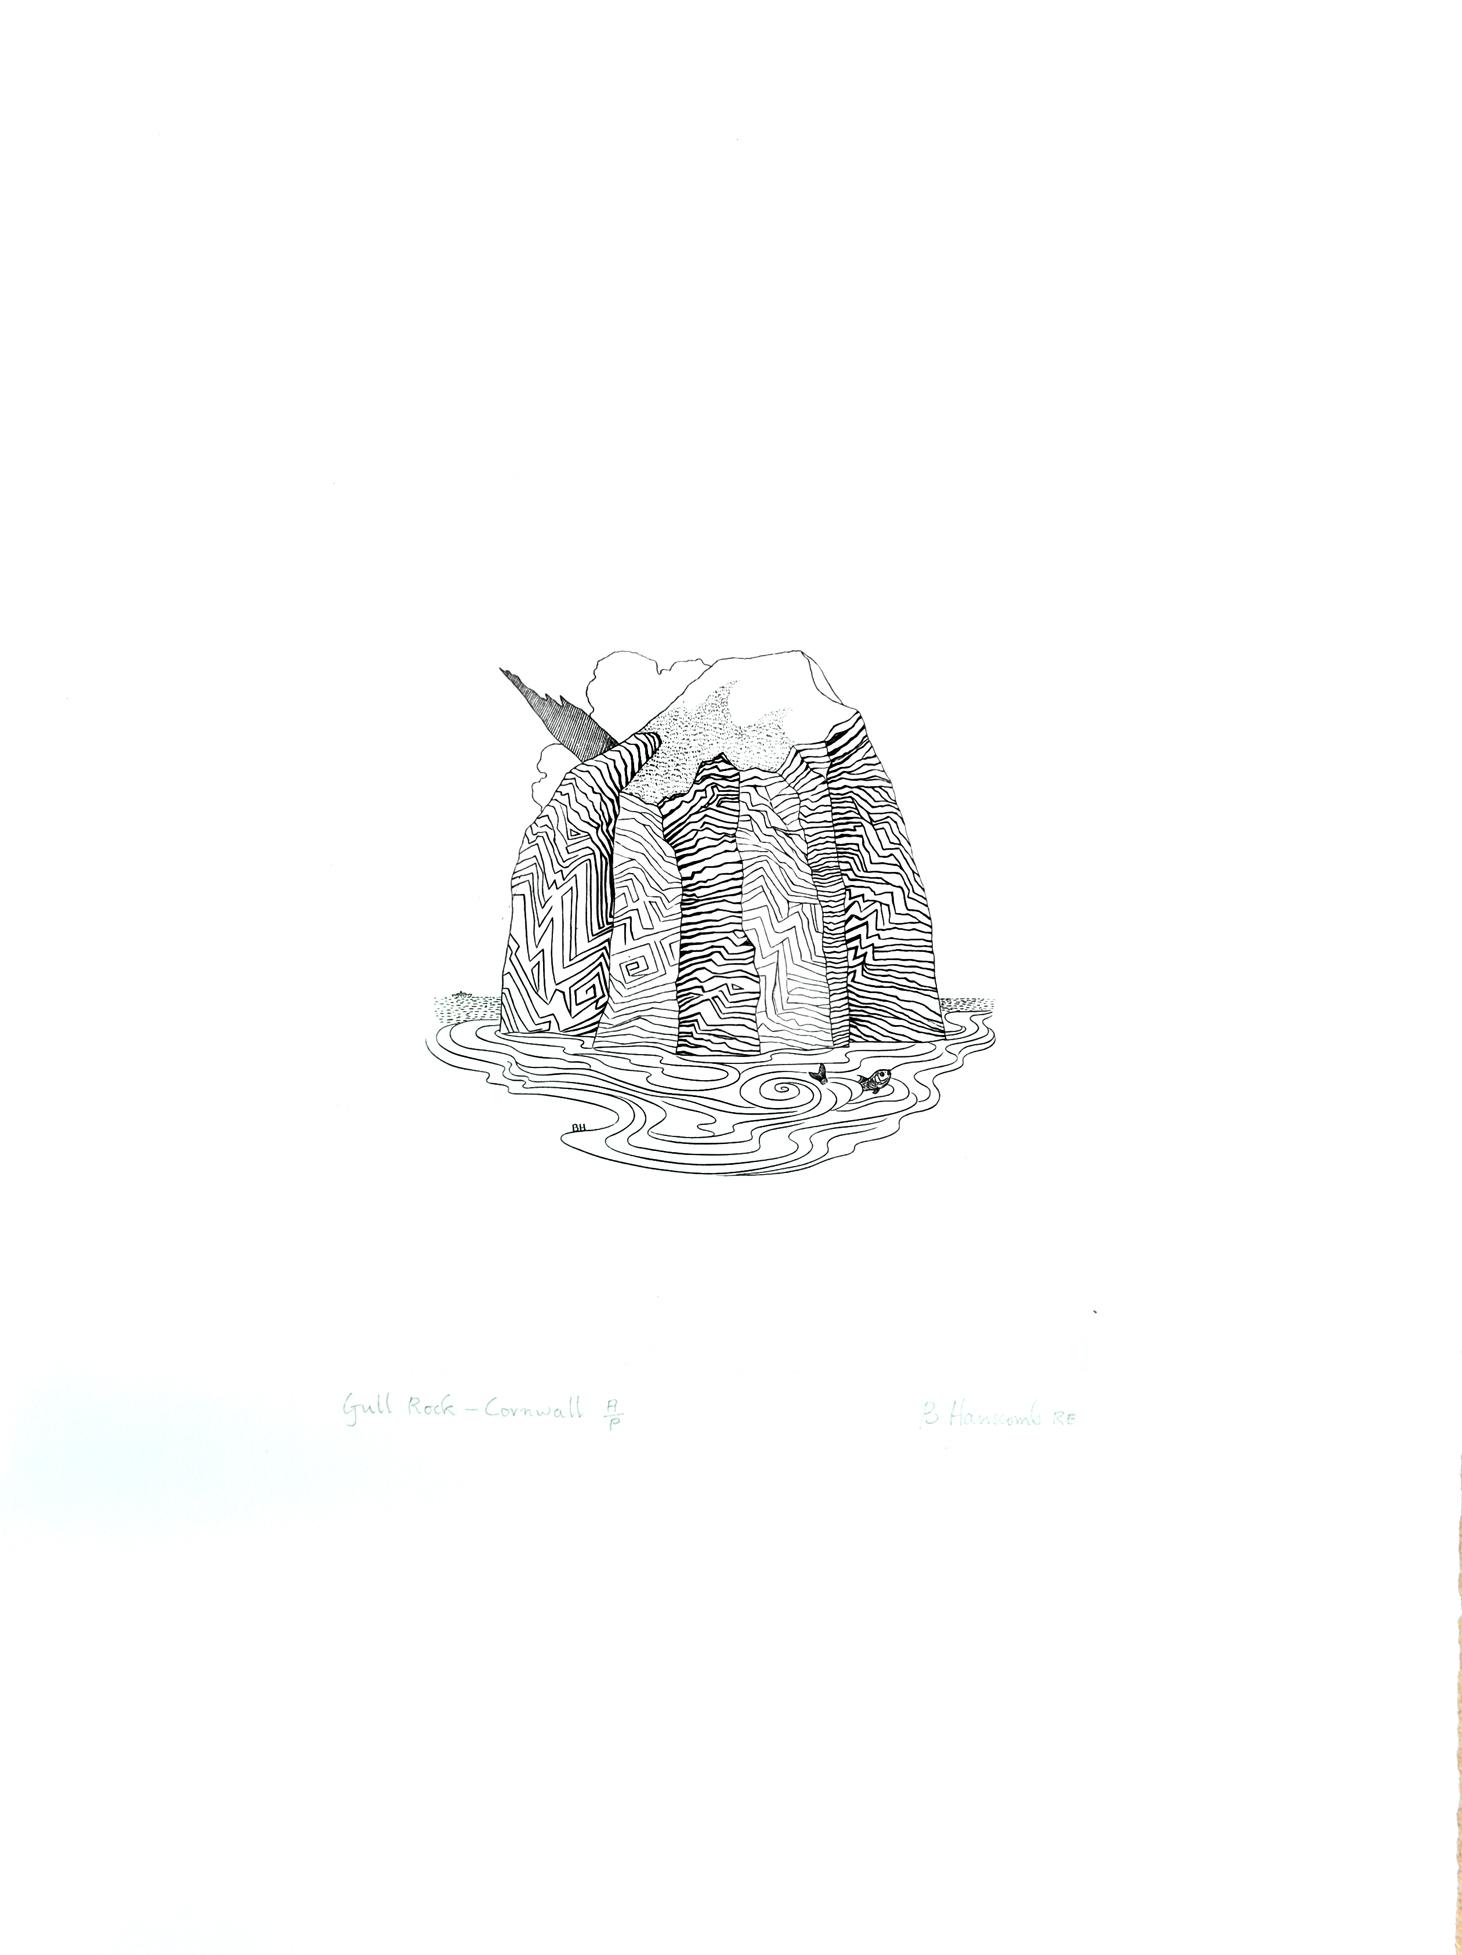 Gull Rock-Cornwall